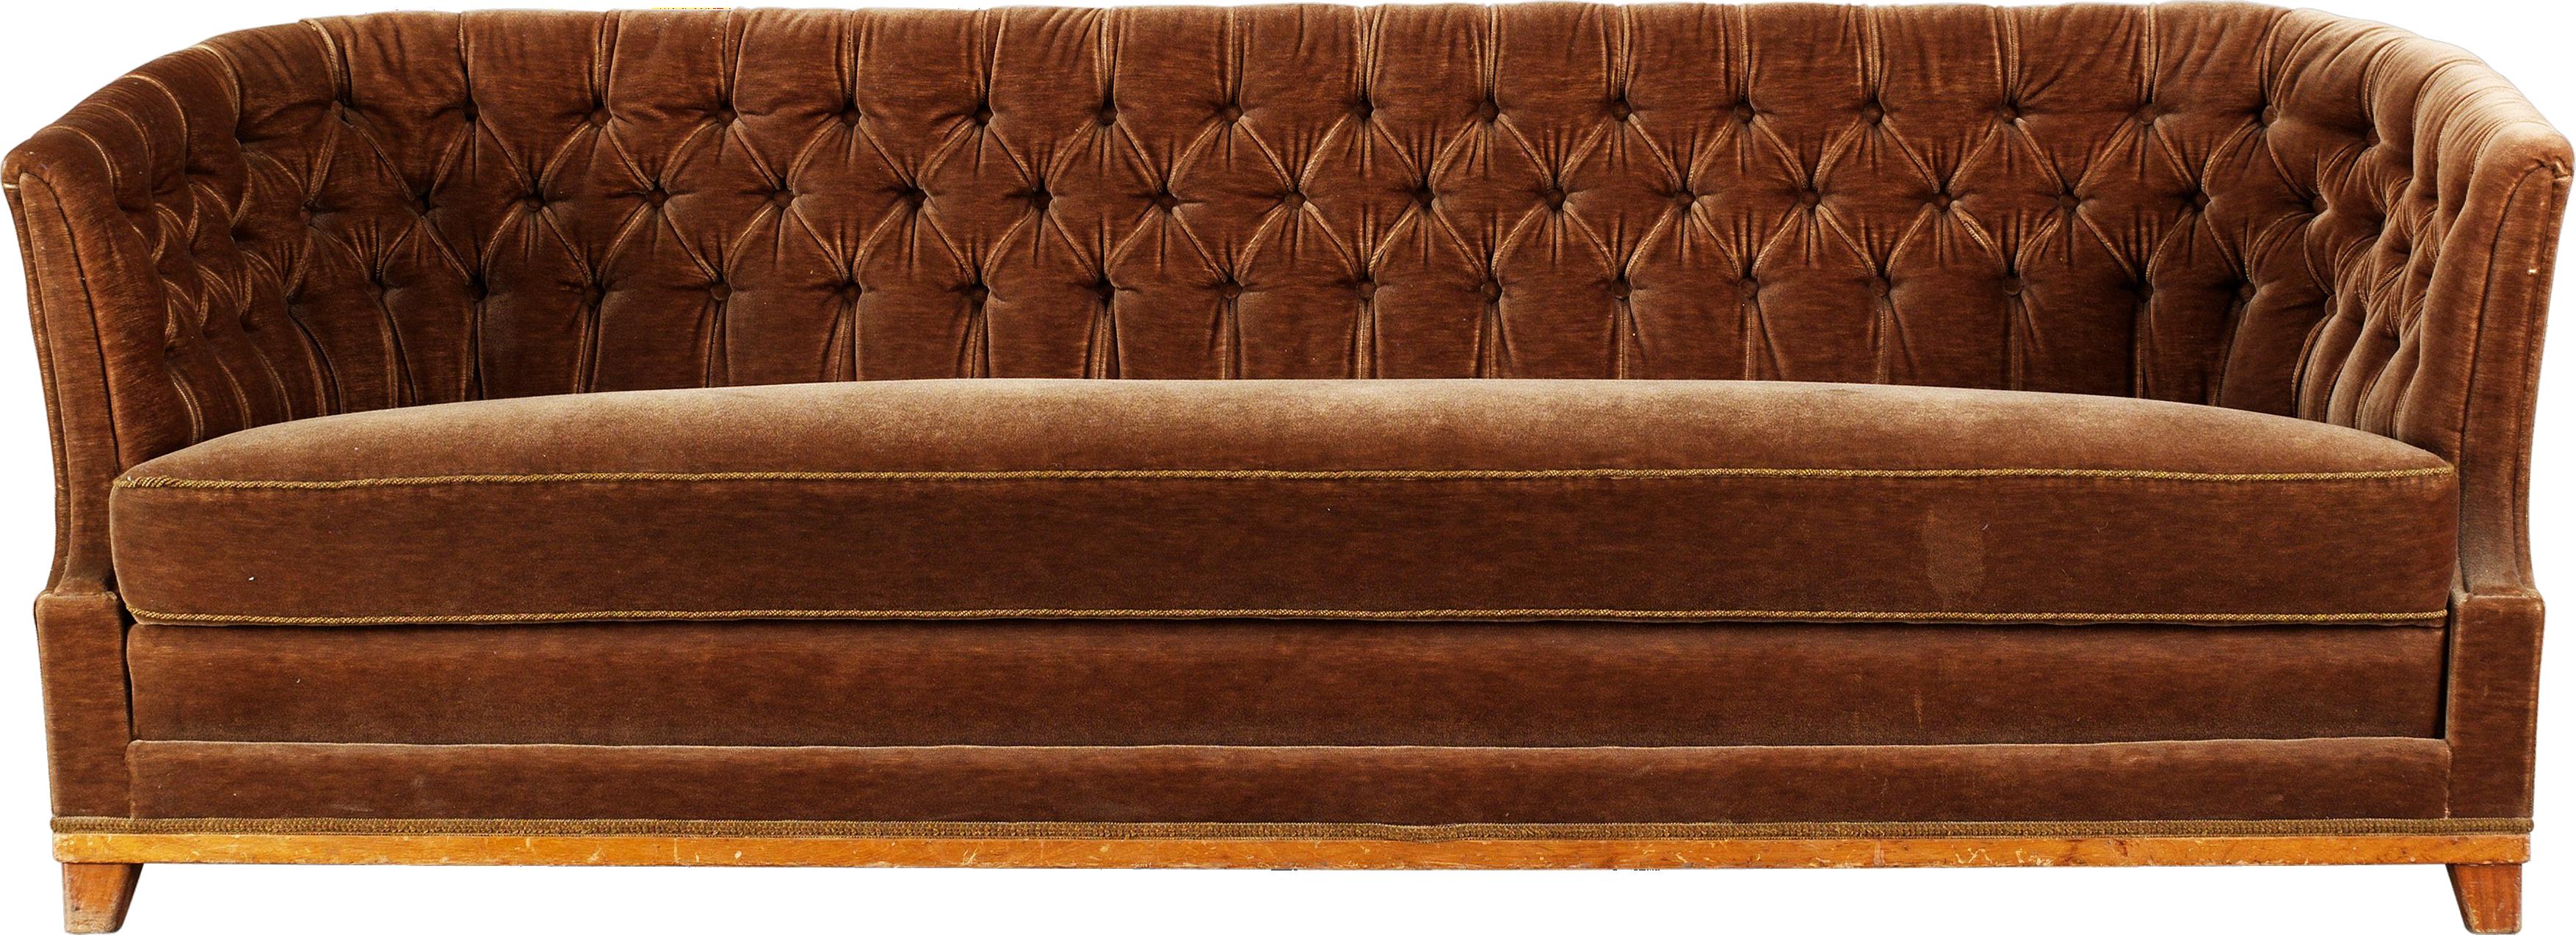 Sofa PNG images free download.